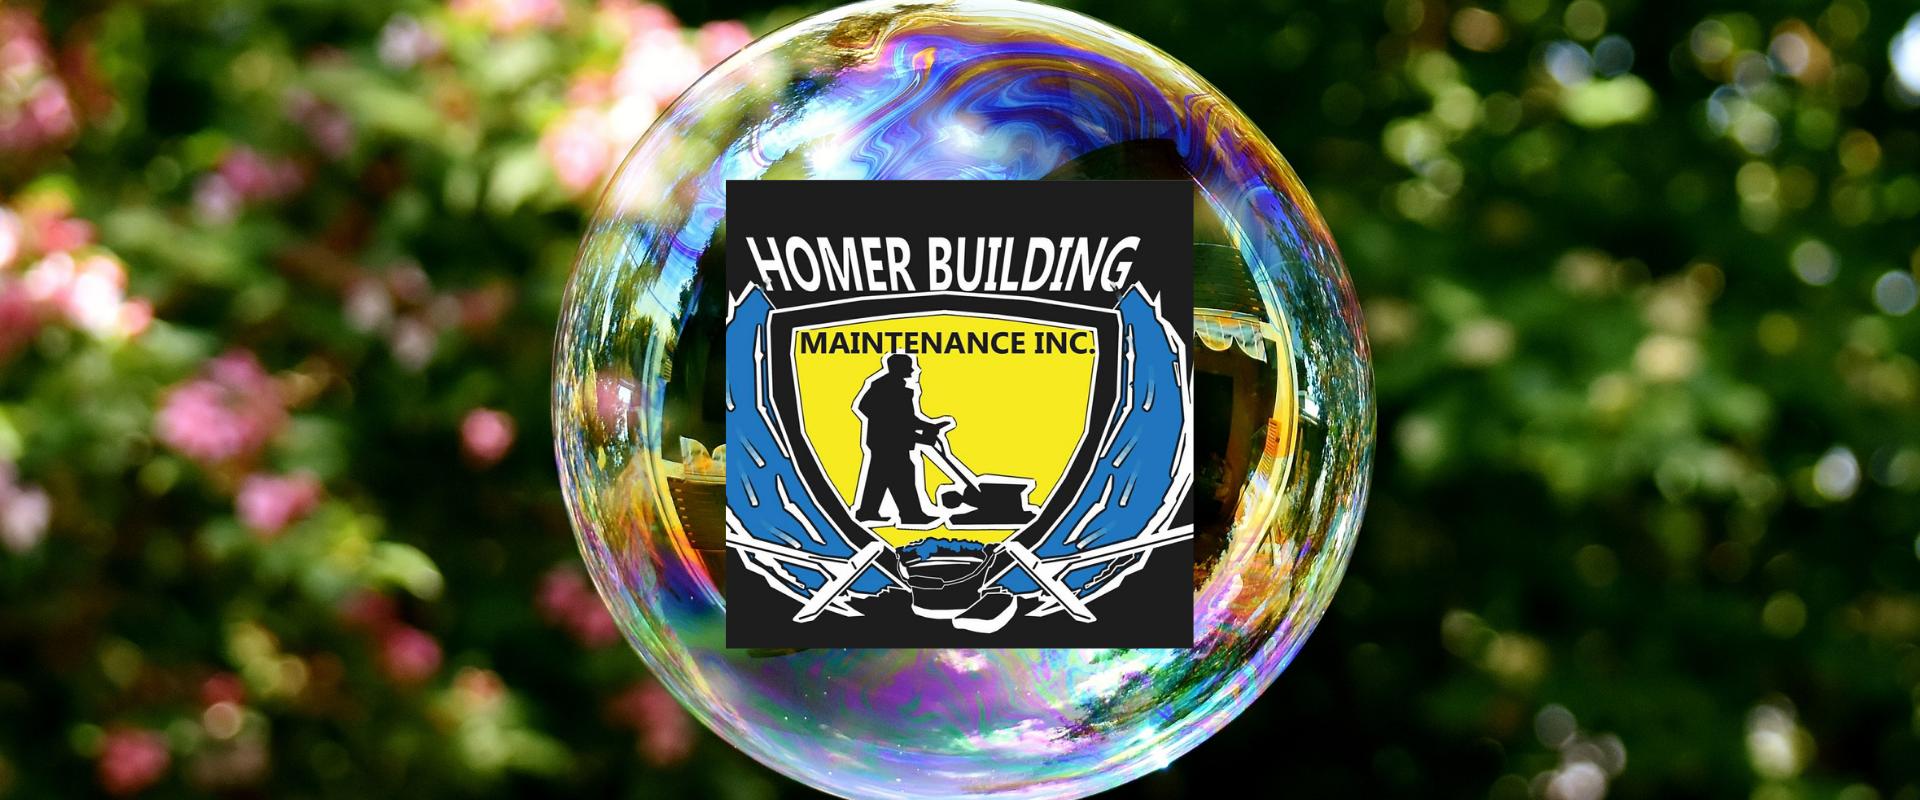 Homer Building Maintenance